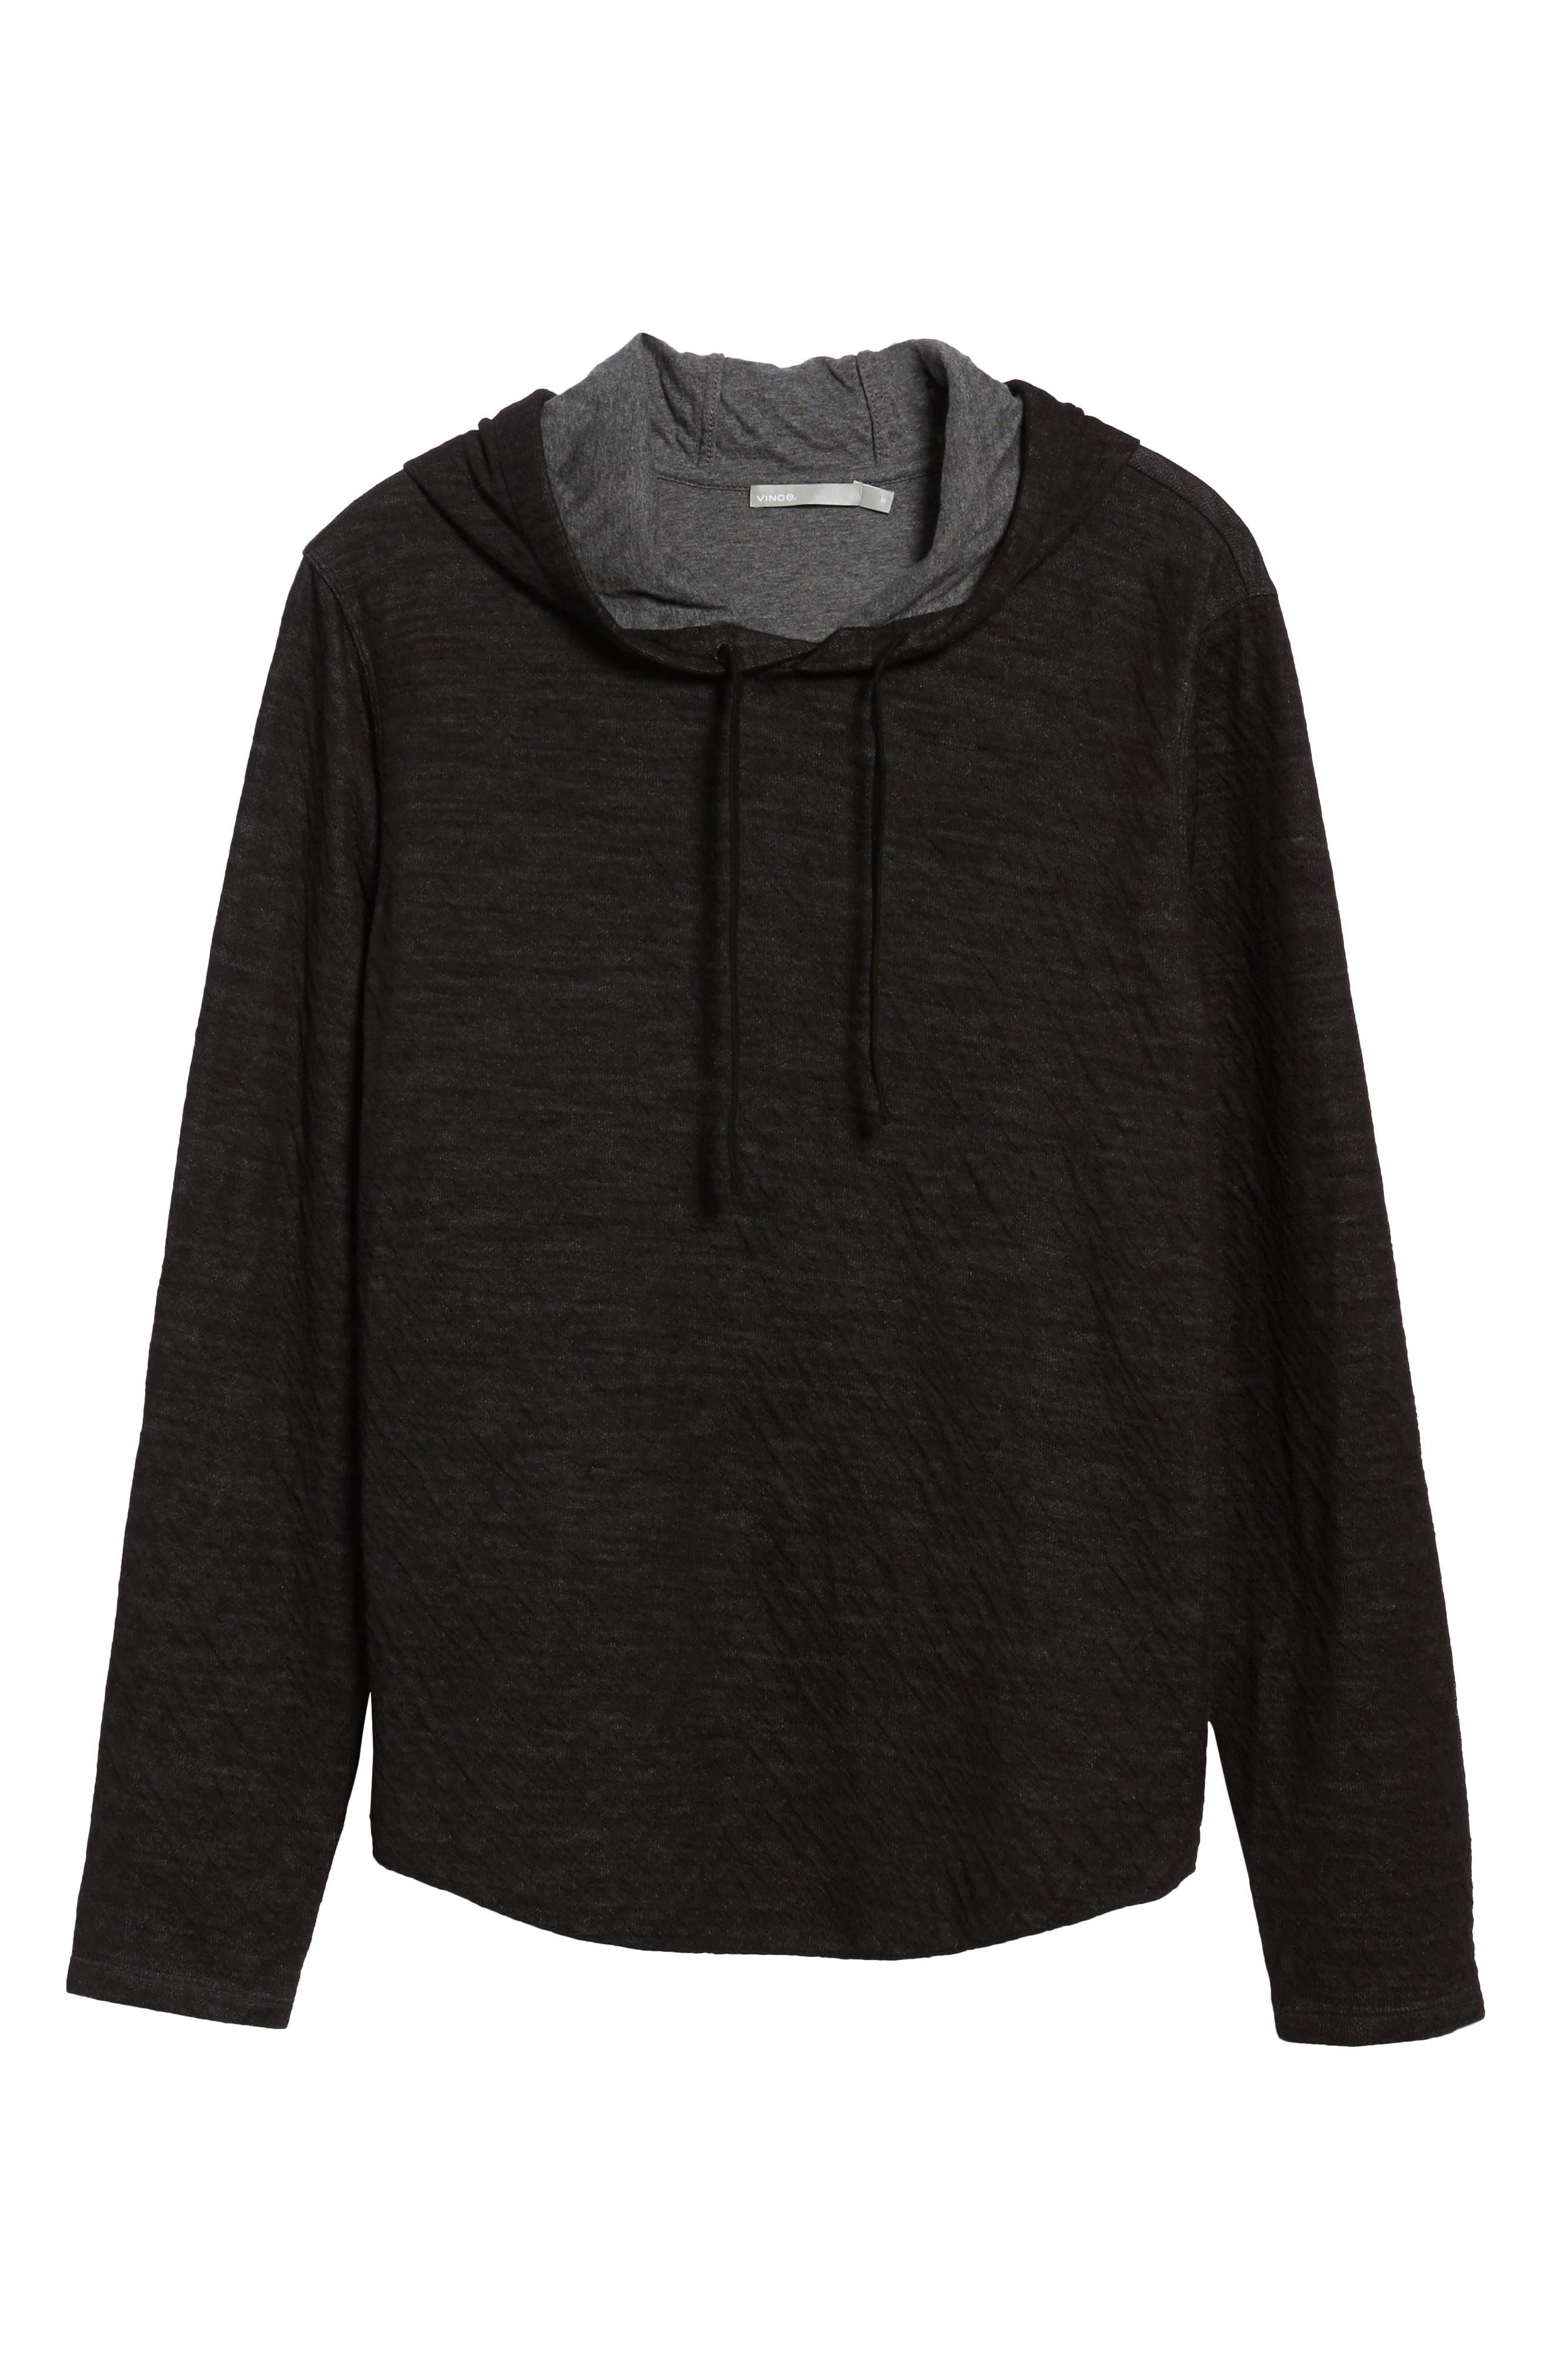 Contrast Double Knit Cotton & Wool Hoodie,                             Alternate thumbnail 6, color,                             Black/ H Carbon